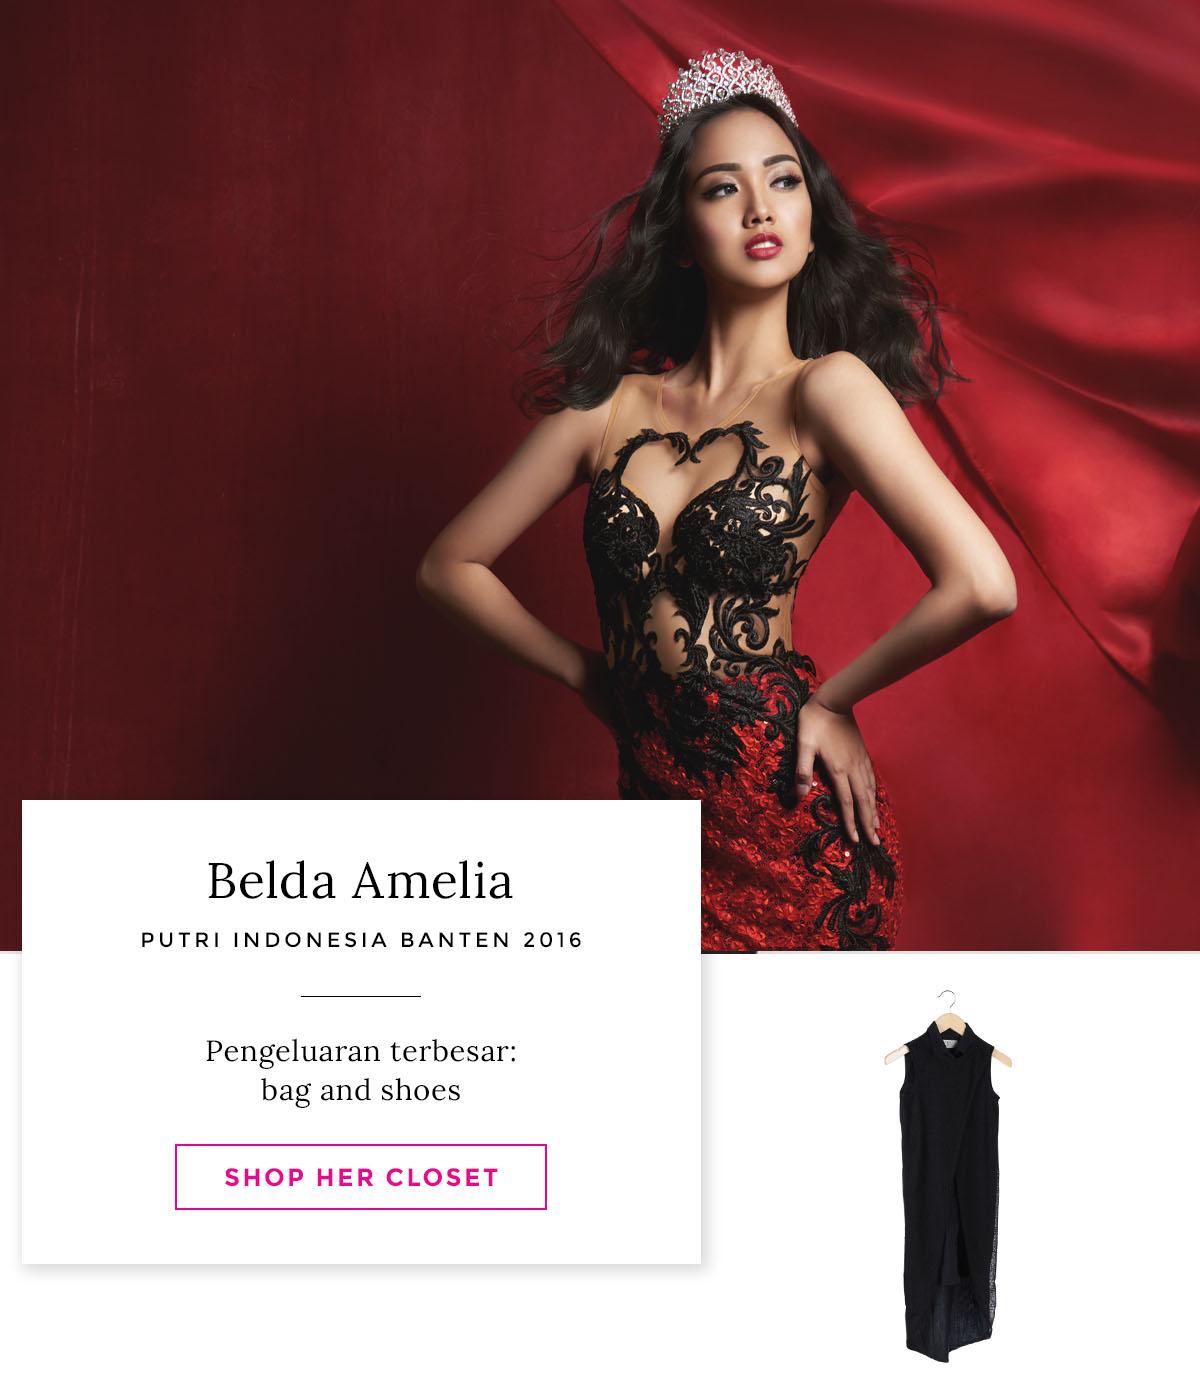 Belda Amelia